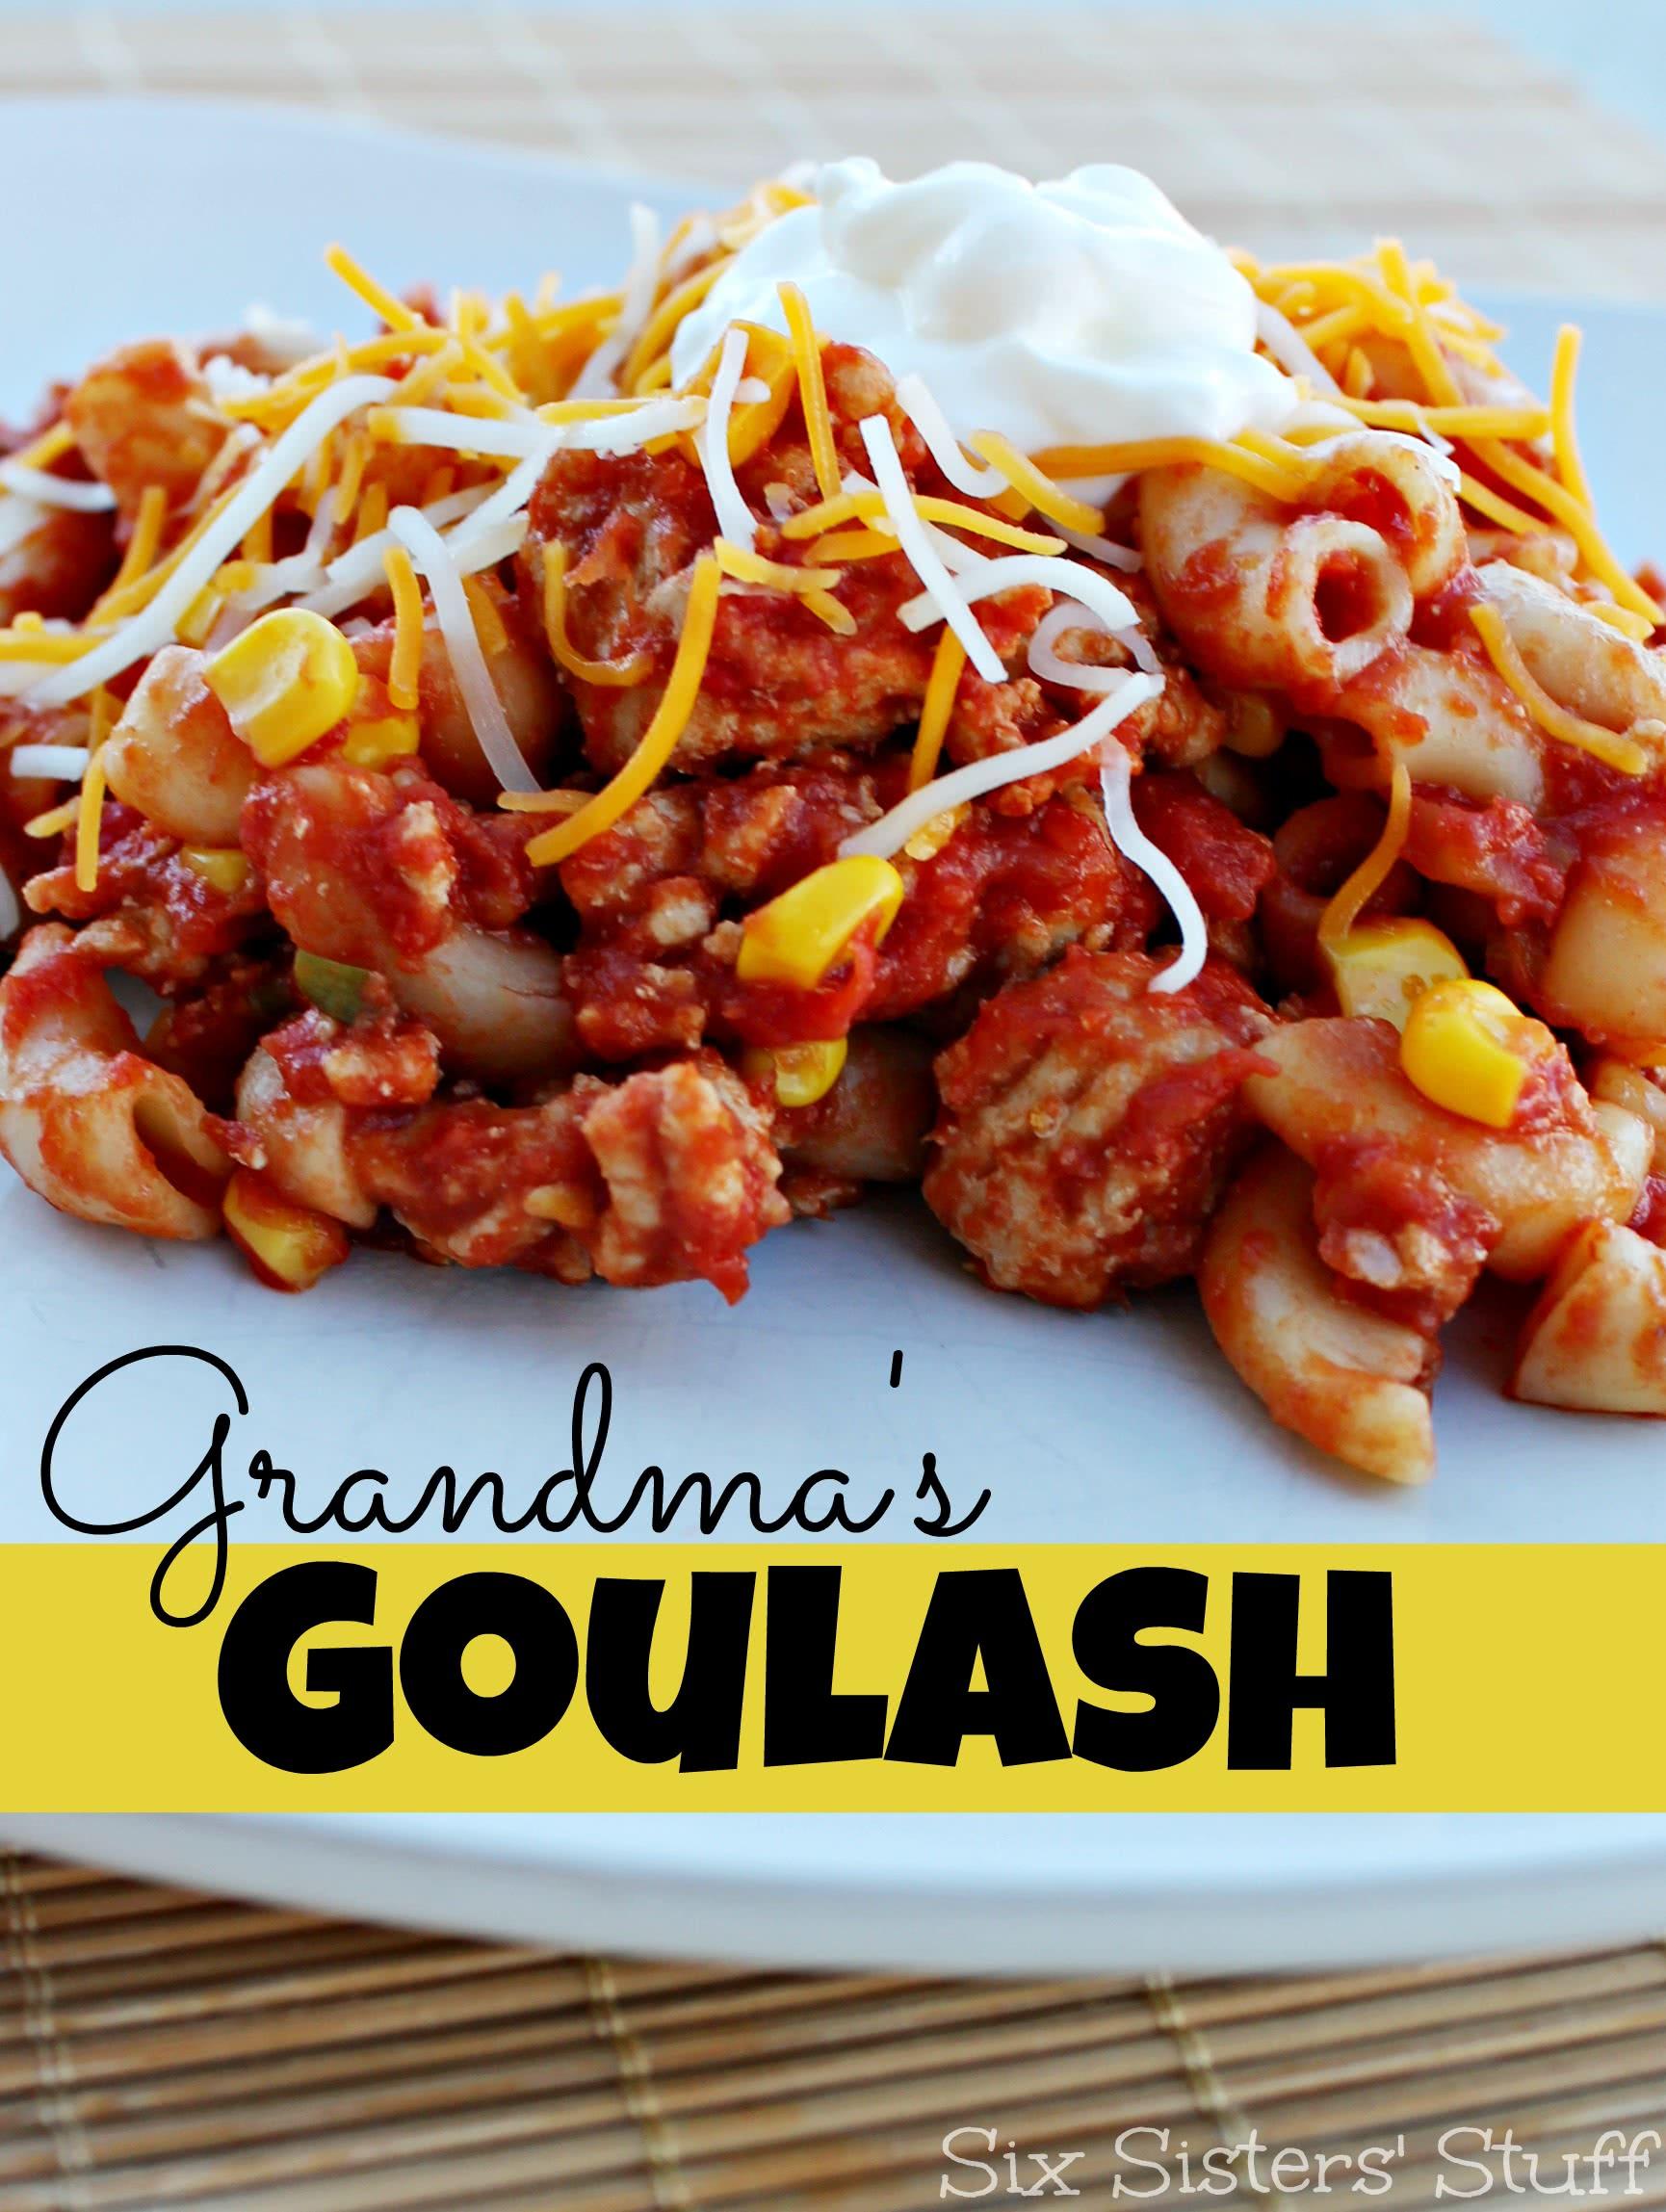 Grandma's Delicious Goulash